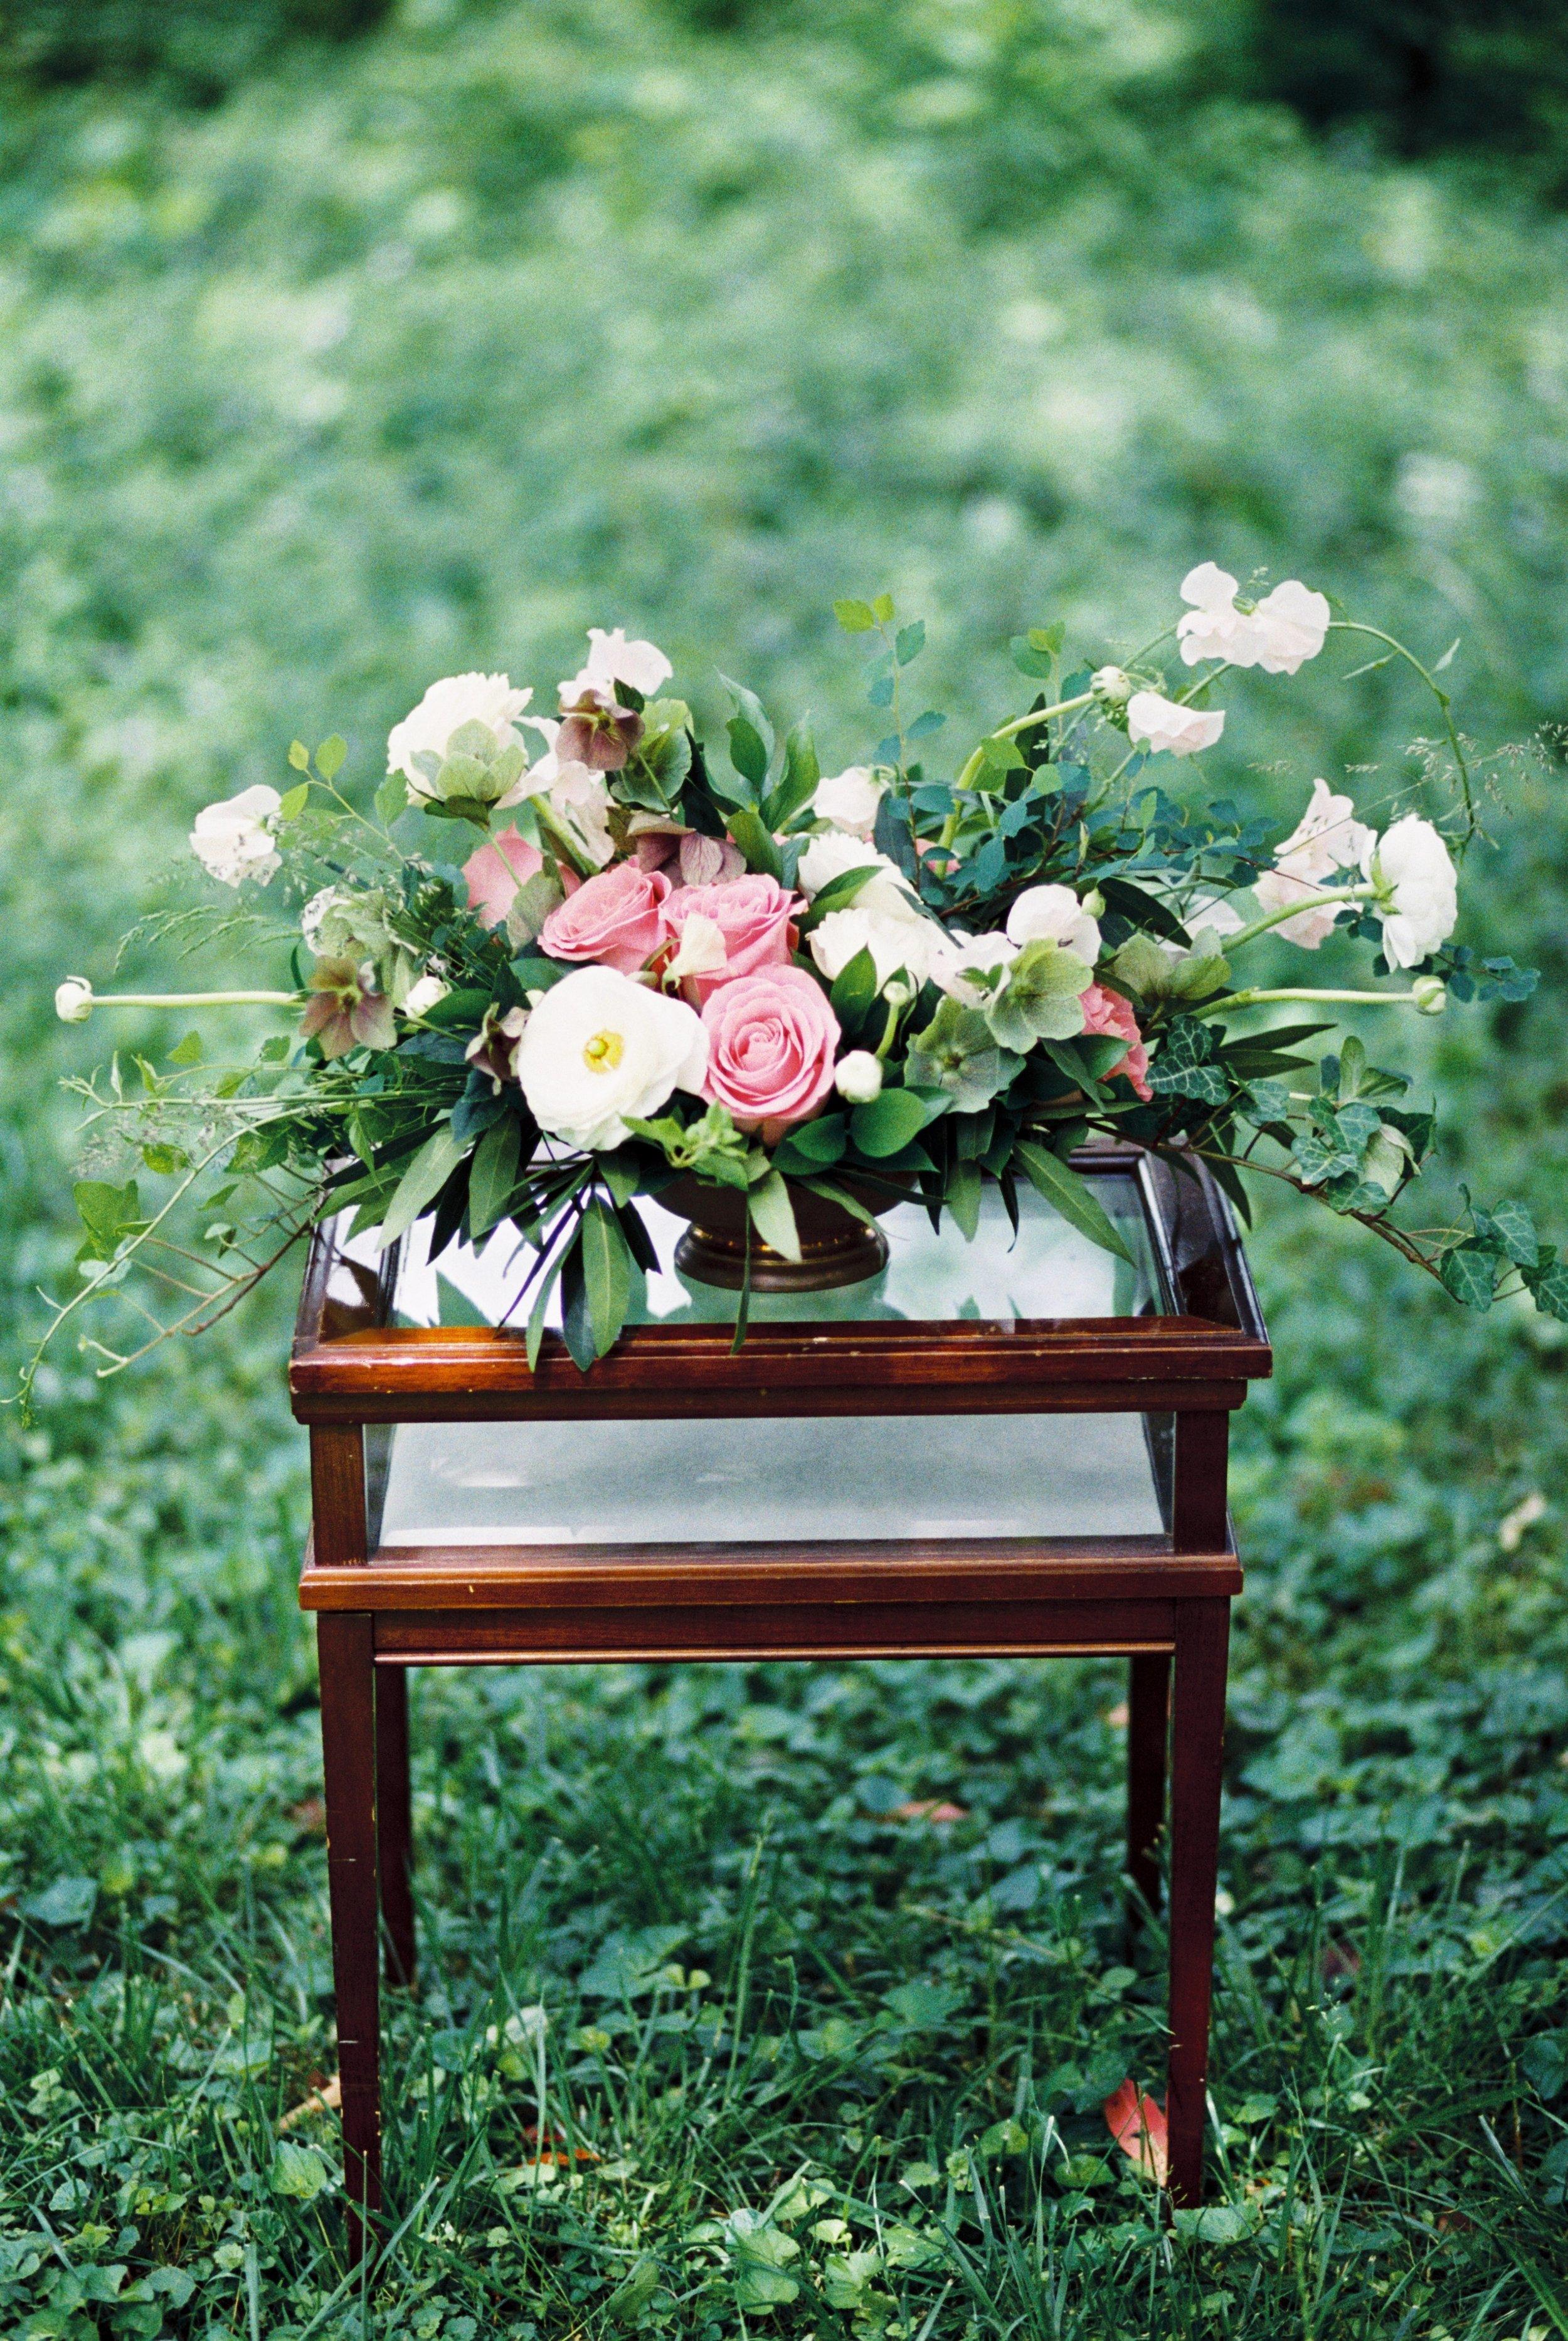 white-and-pink-roses-wedding-centerpiece-destination-florist